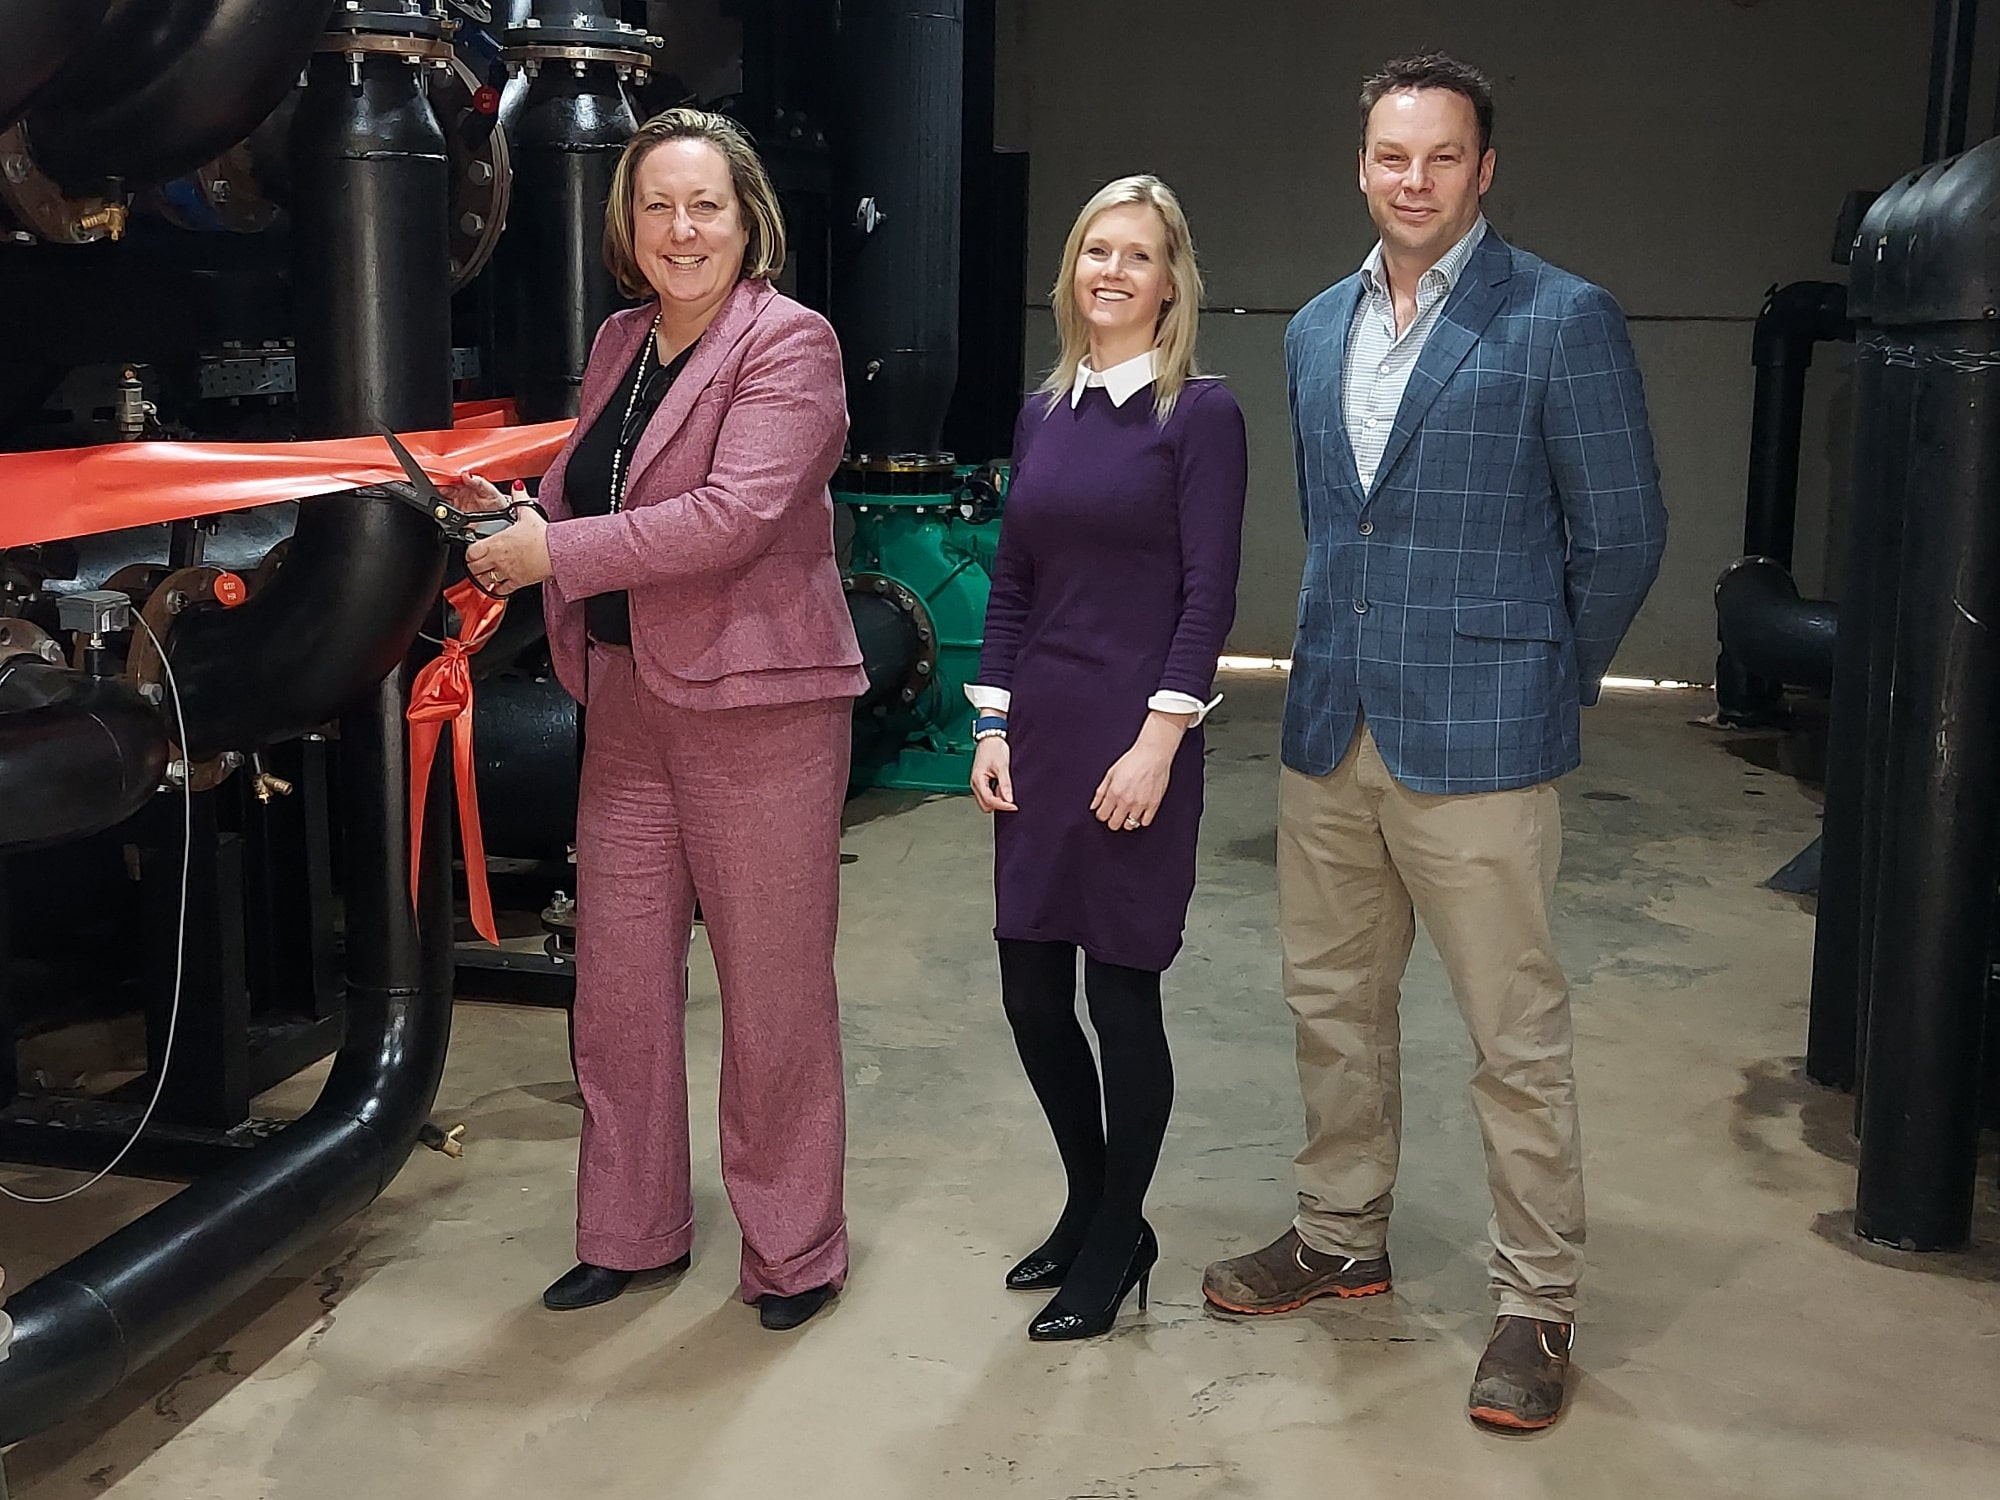 Heat pump project opened by Anne-Marie Trevelyan MP